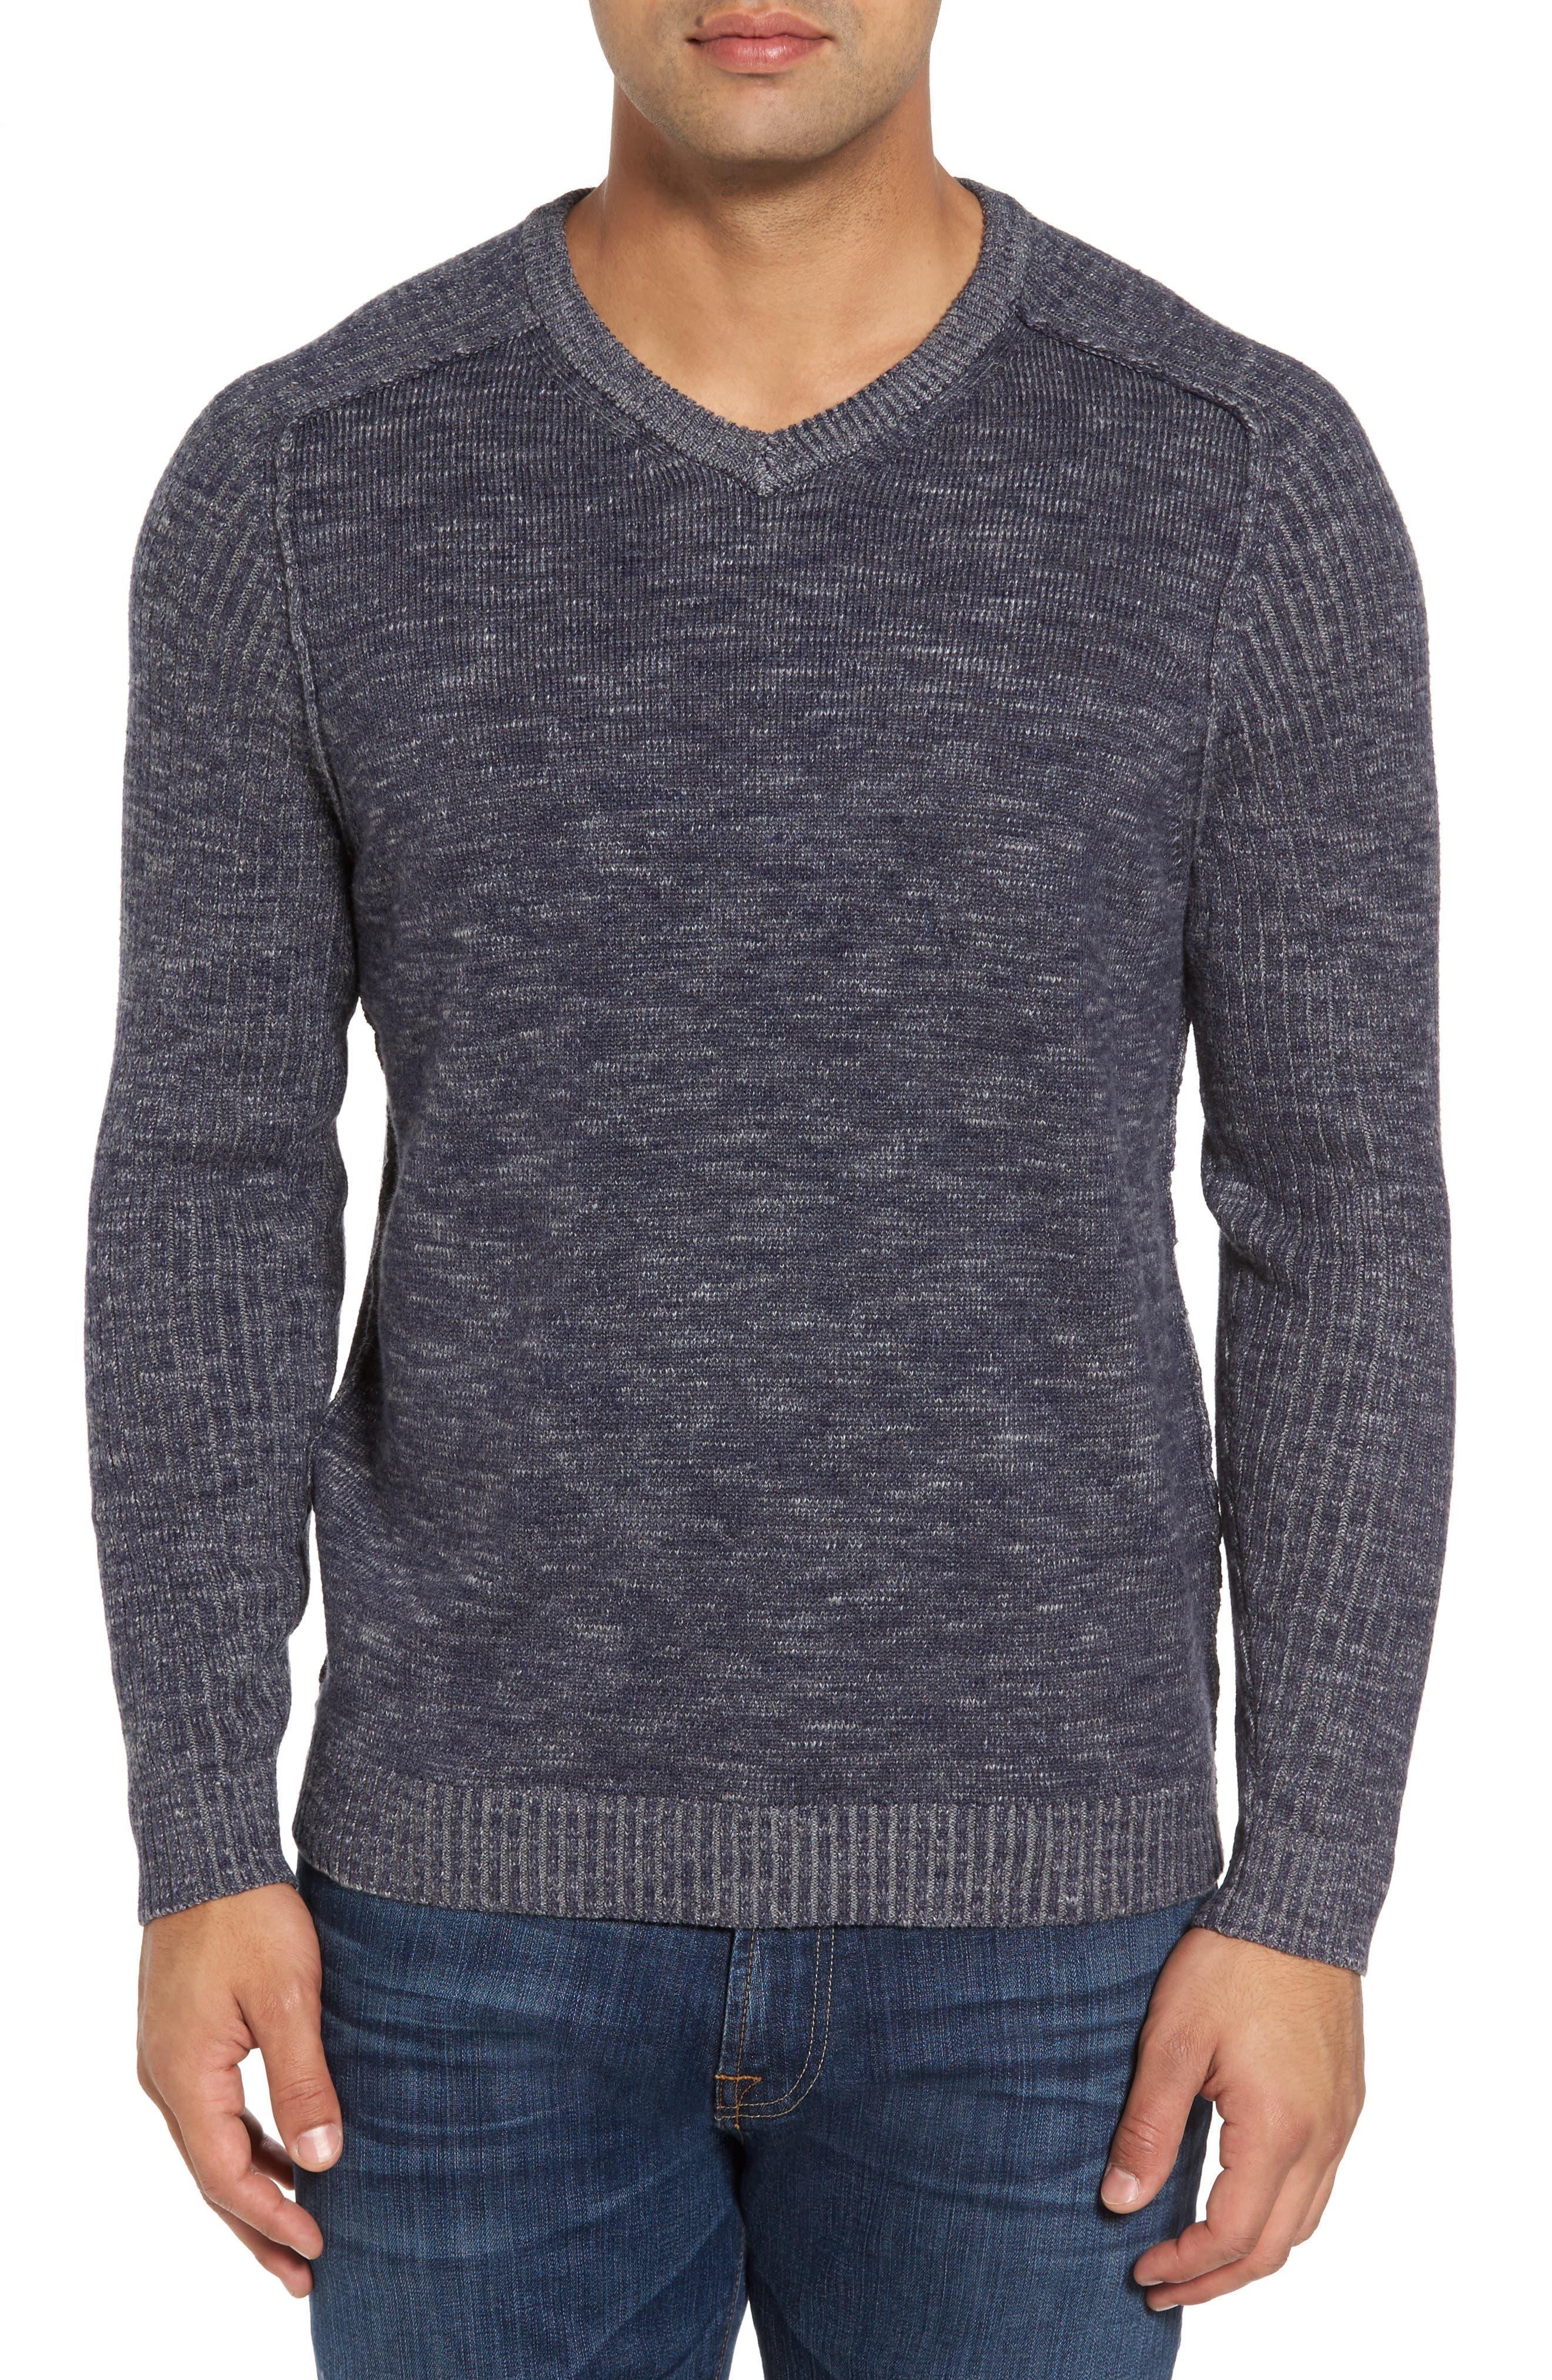 Gran Rey Flip Reversible Cotton & Wool Sweater,                         Main,                         color, Ocean Deep Heather